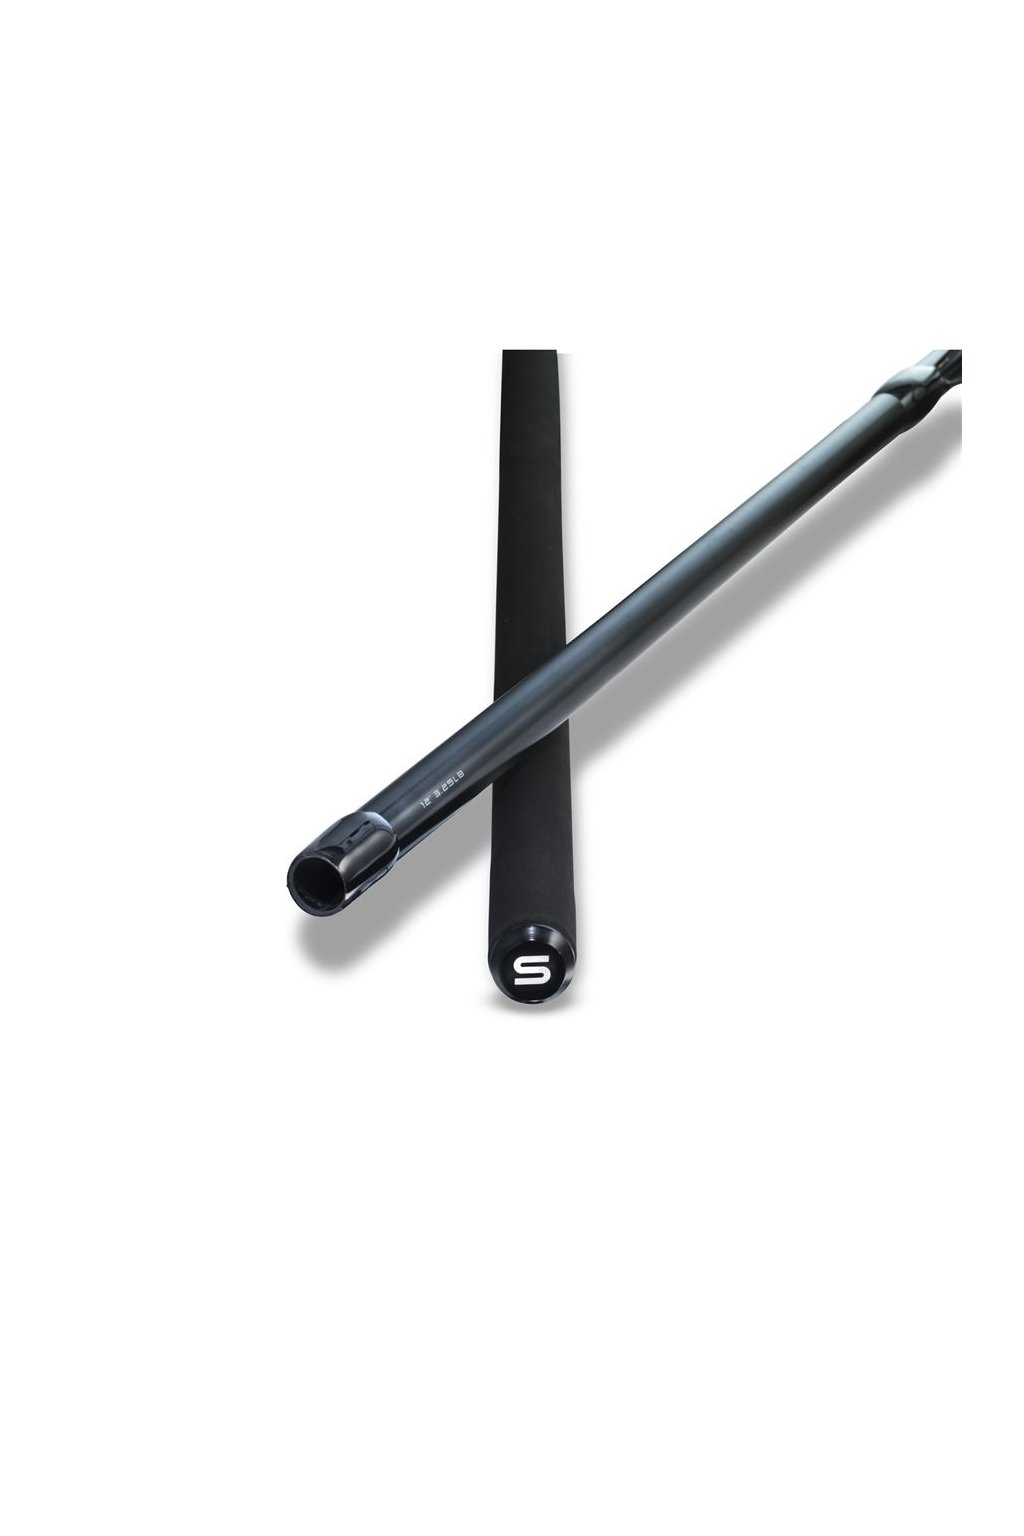 Sonik: Prut Xtractor Recon Carp Rod 12' 3,6m 3,25lb